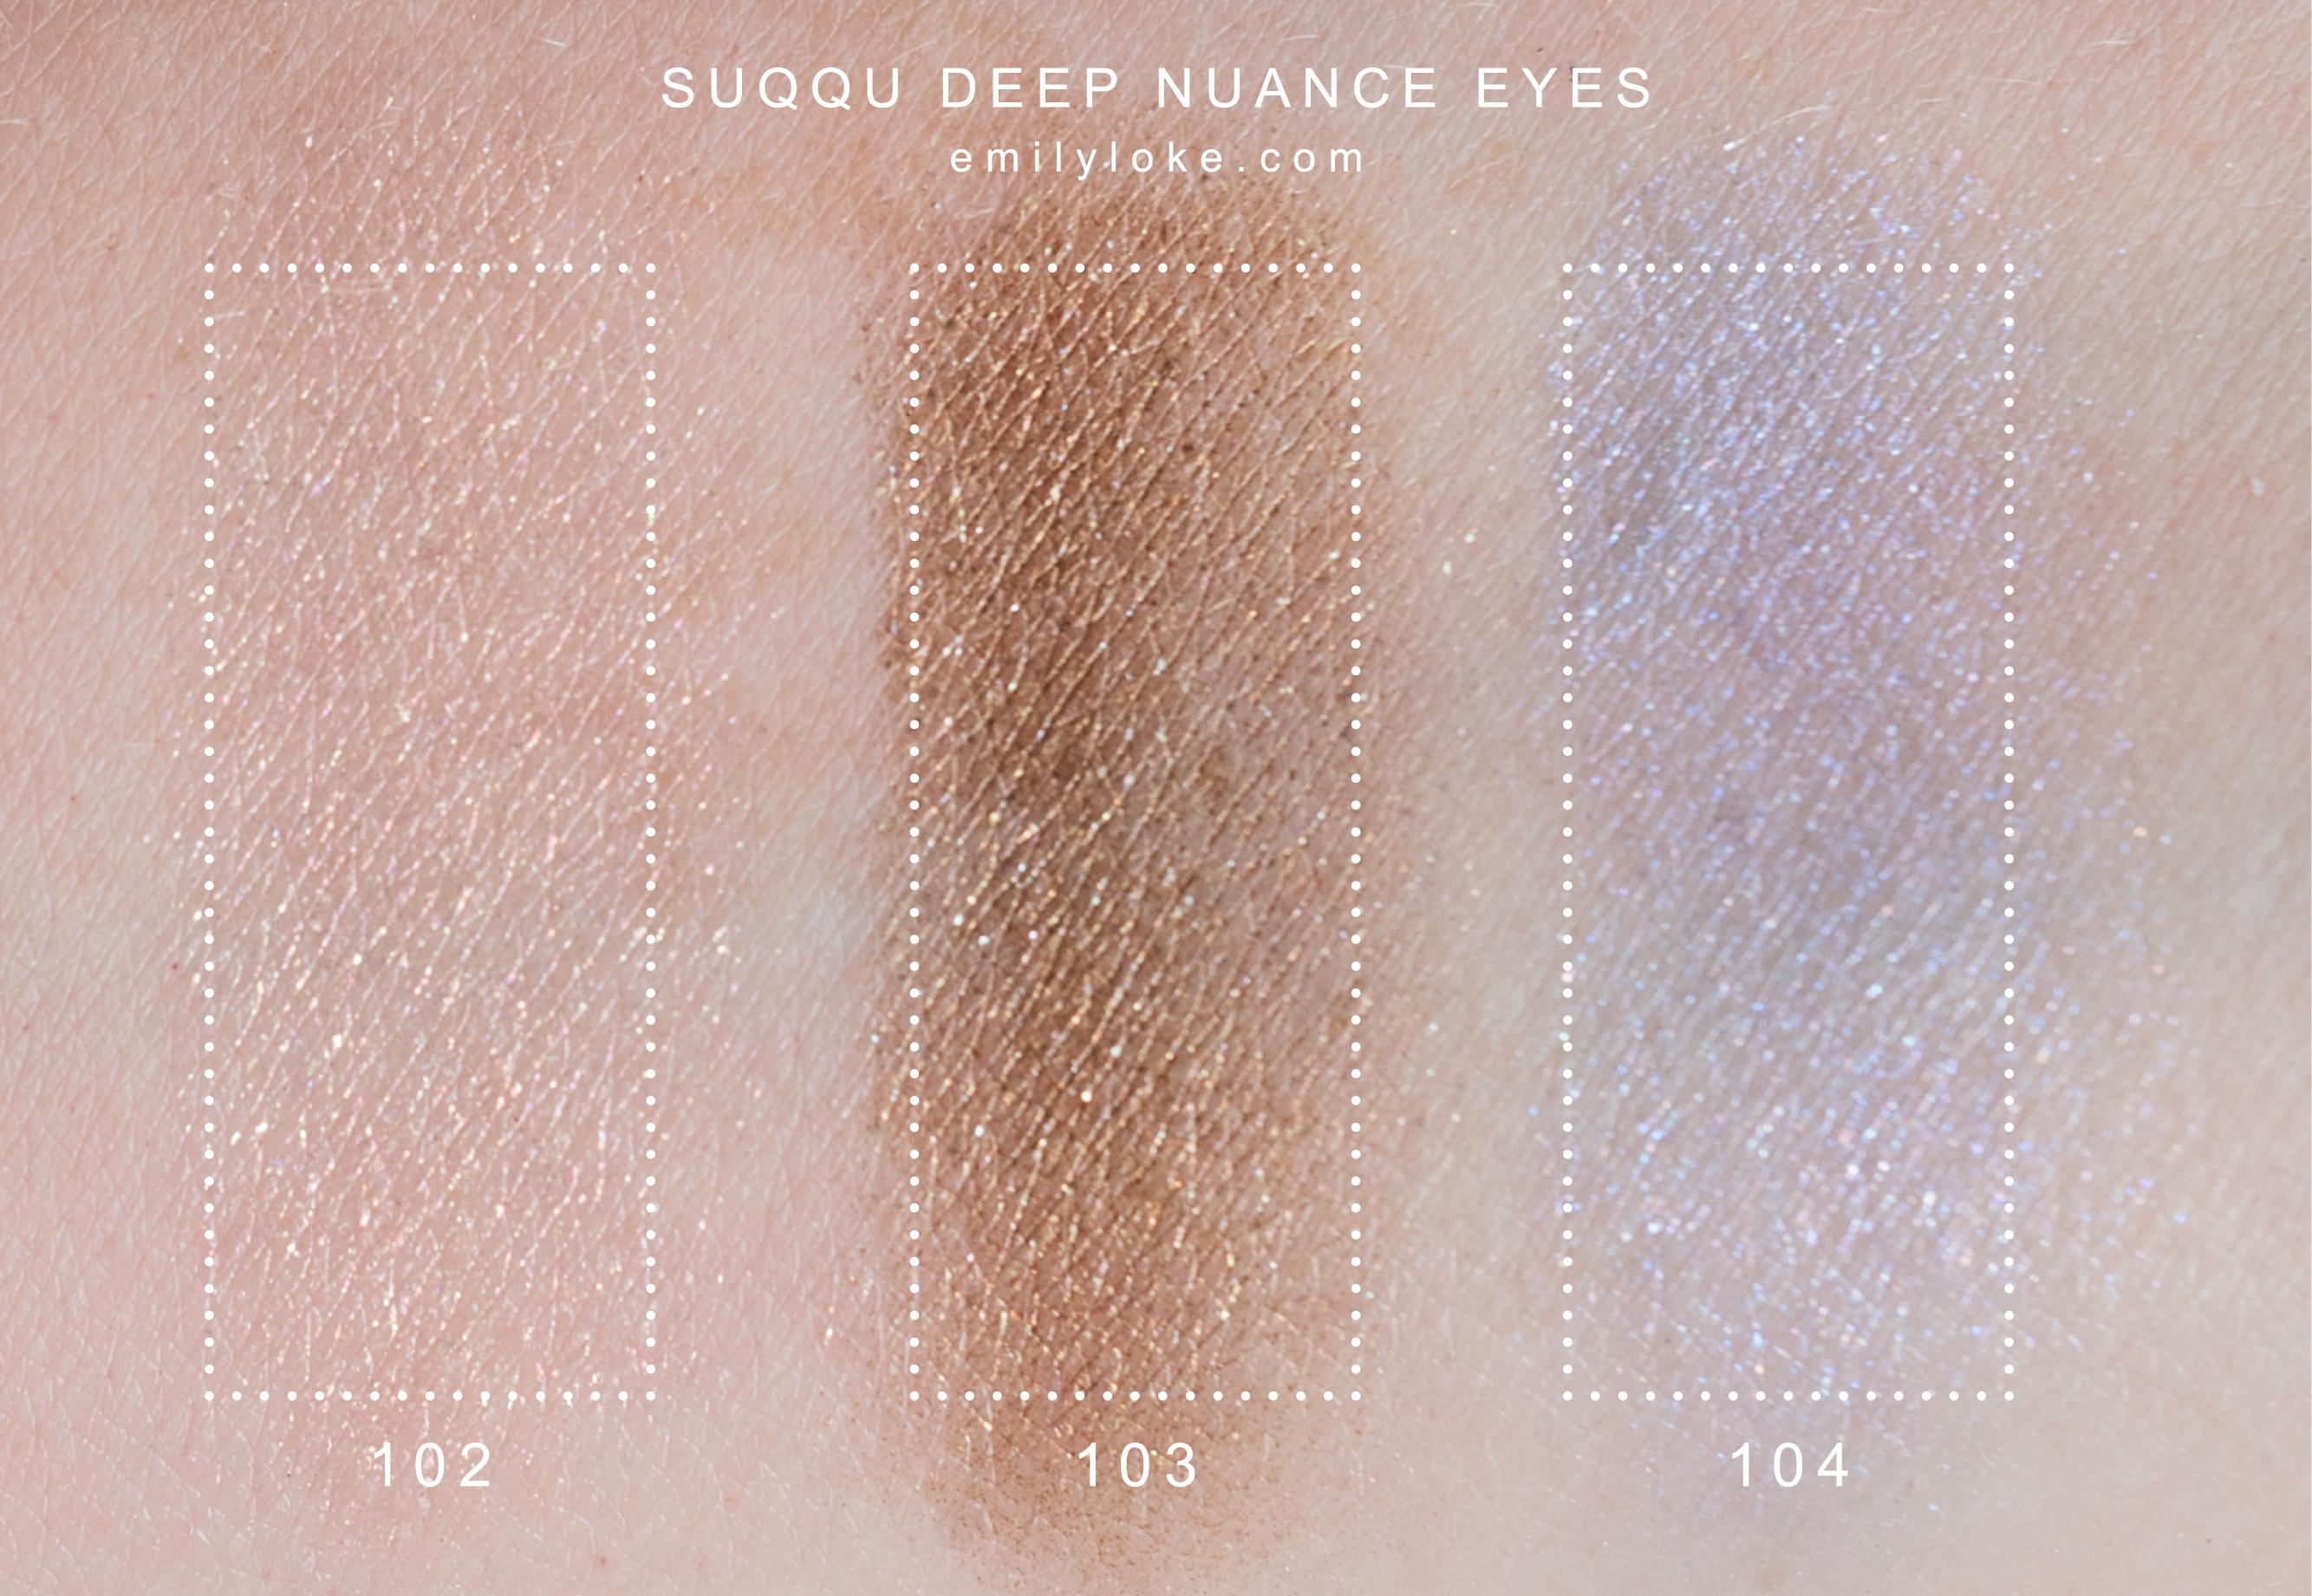 suqqu deep nuance eyes